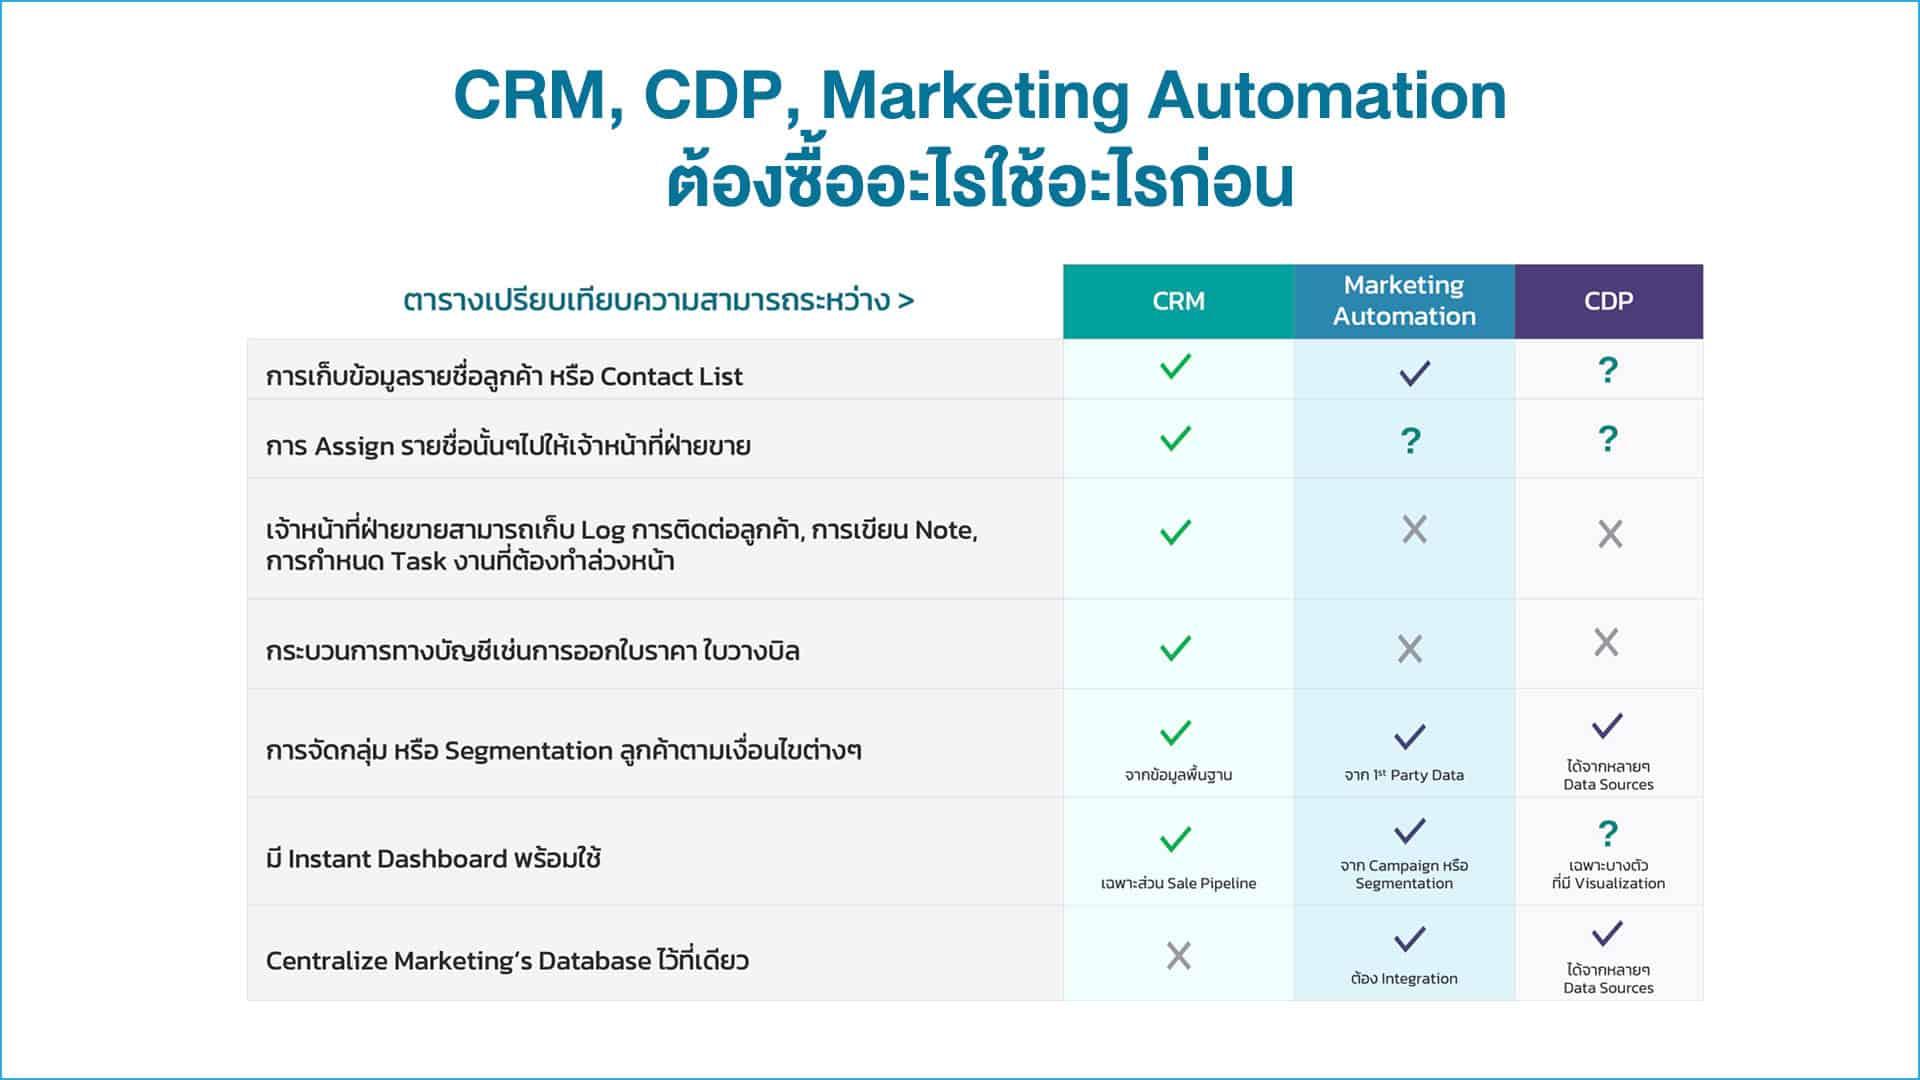 CRM, CDP, Marketing Automation ต้องใช้อะไรก่อน